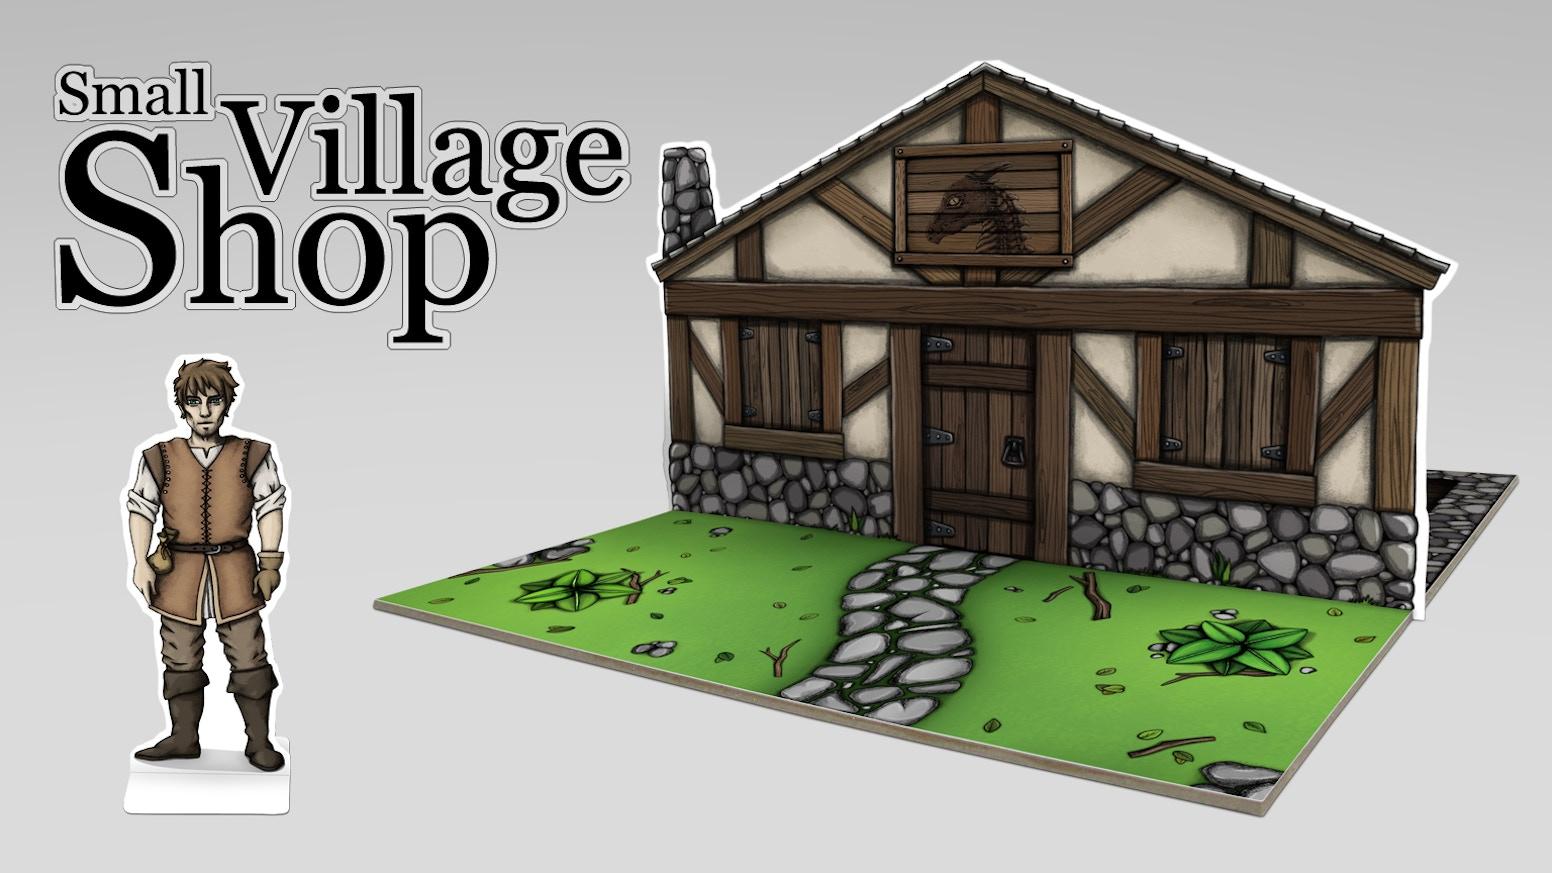 Village Shop   Fantasy Paper Miniature for tabletop RPG by Dominique